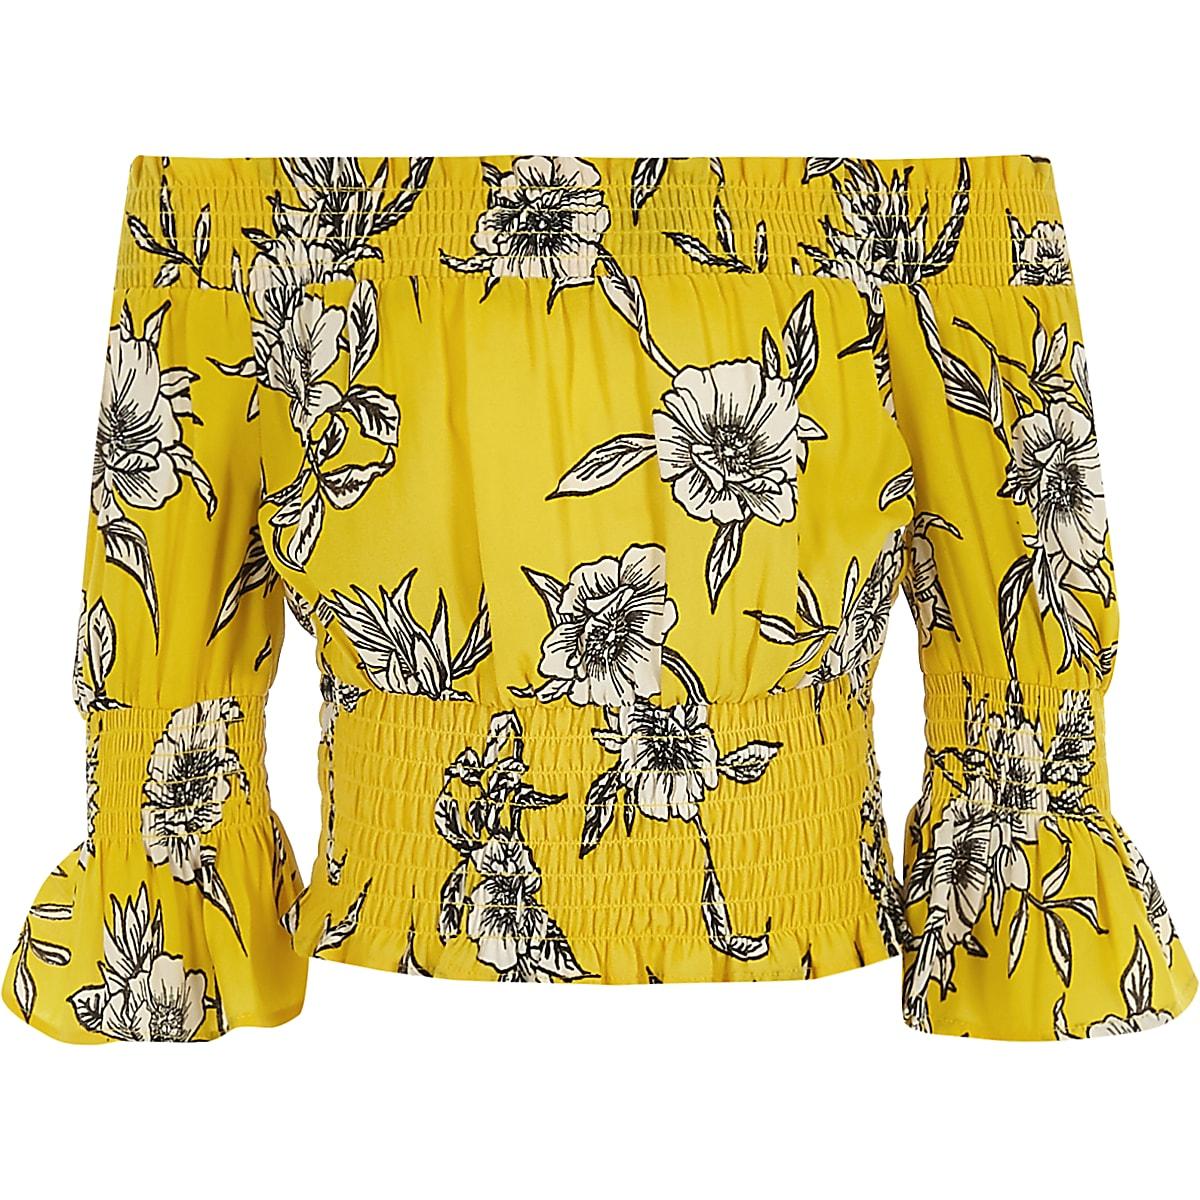 15e6feba36eec4 Girls yellow floral print shirred bardot top - Long Sleeve Tops - Tops -  girls